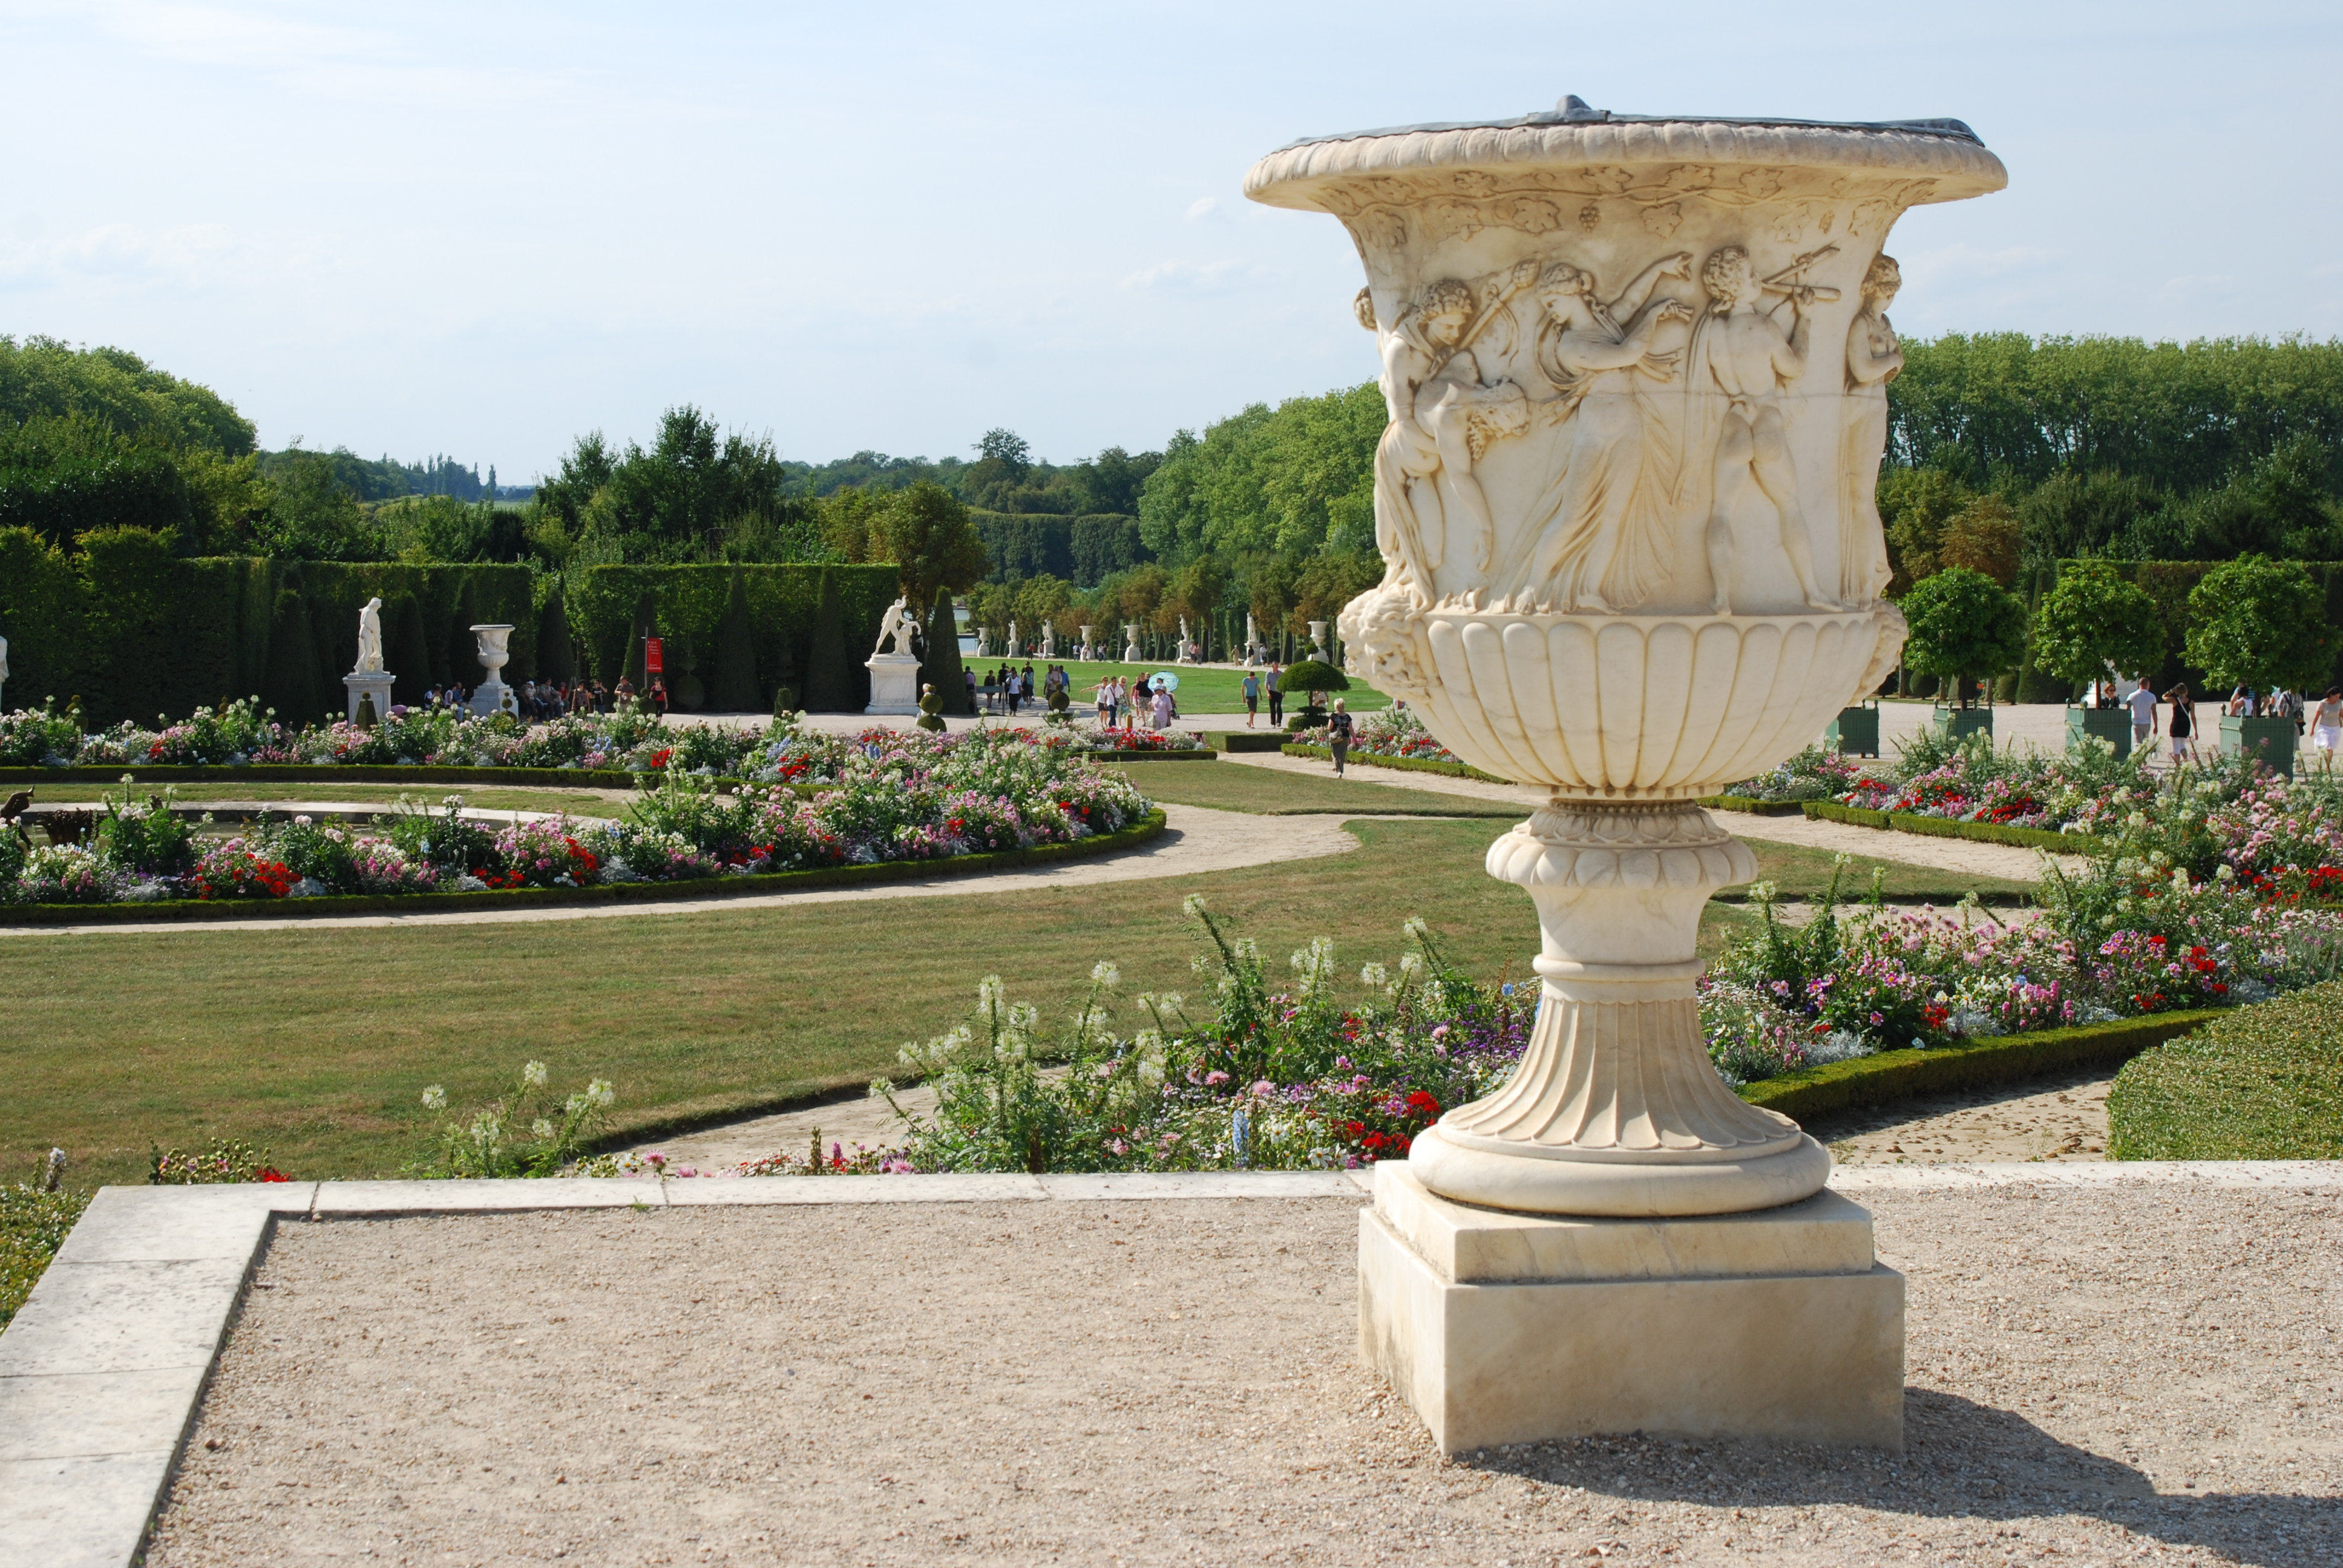 Jardins de versailles amphore scultpt e andr le n tre for Amphore de jardin